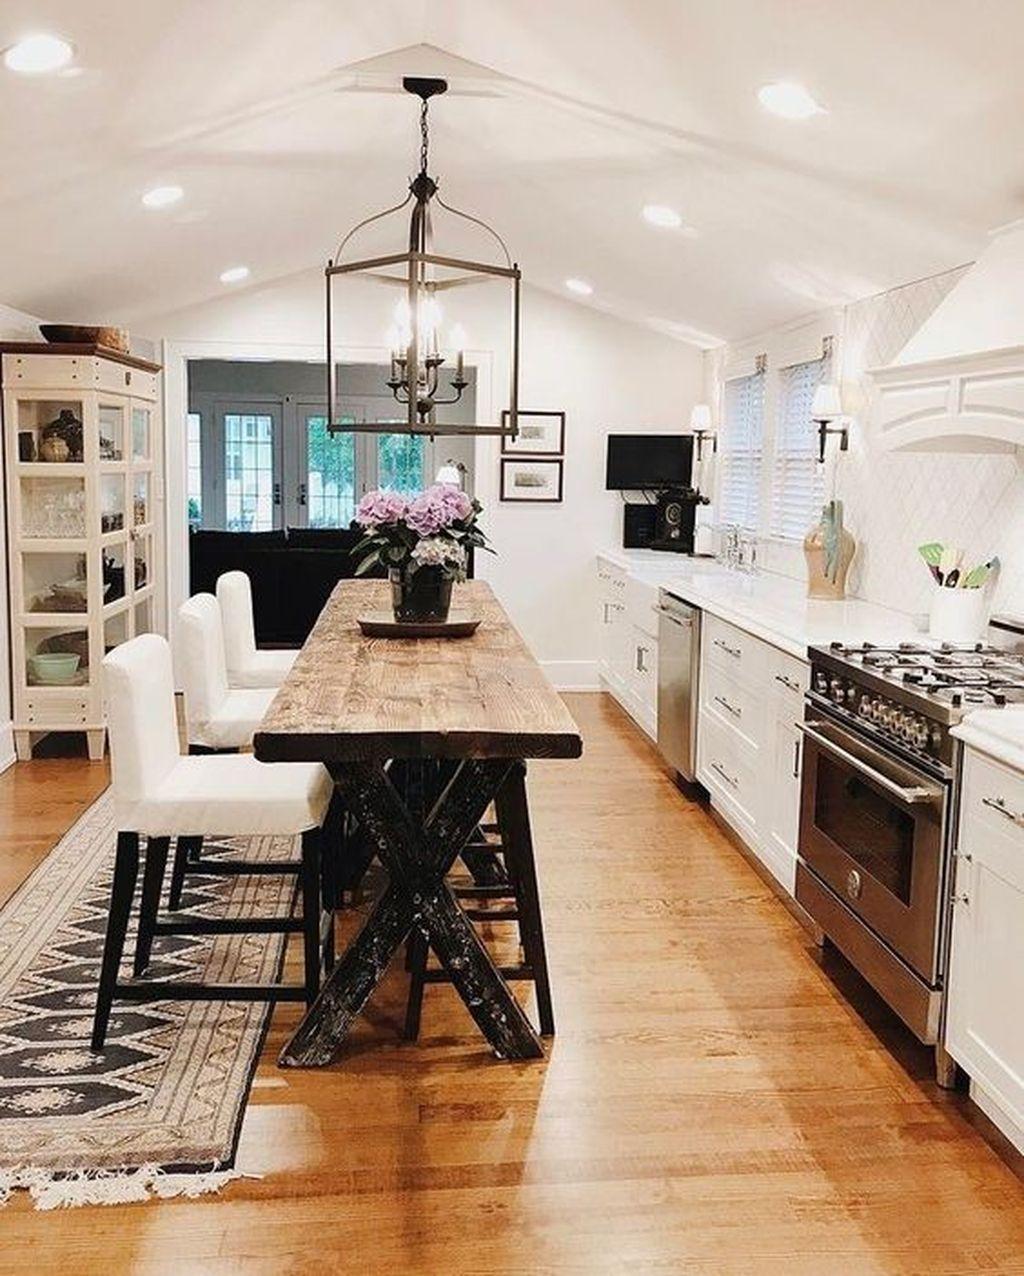 Wohnkultur esszimmer impressive  gorgeous farmhouse kitchen island decor ideas